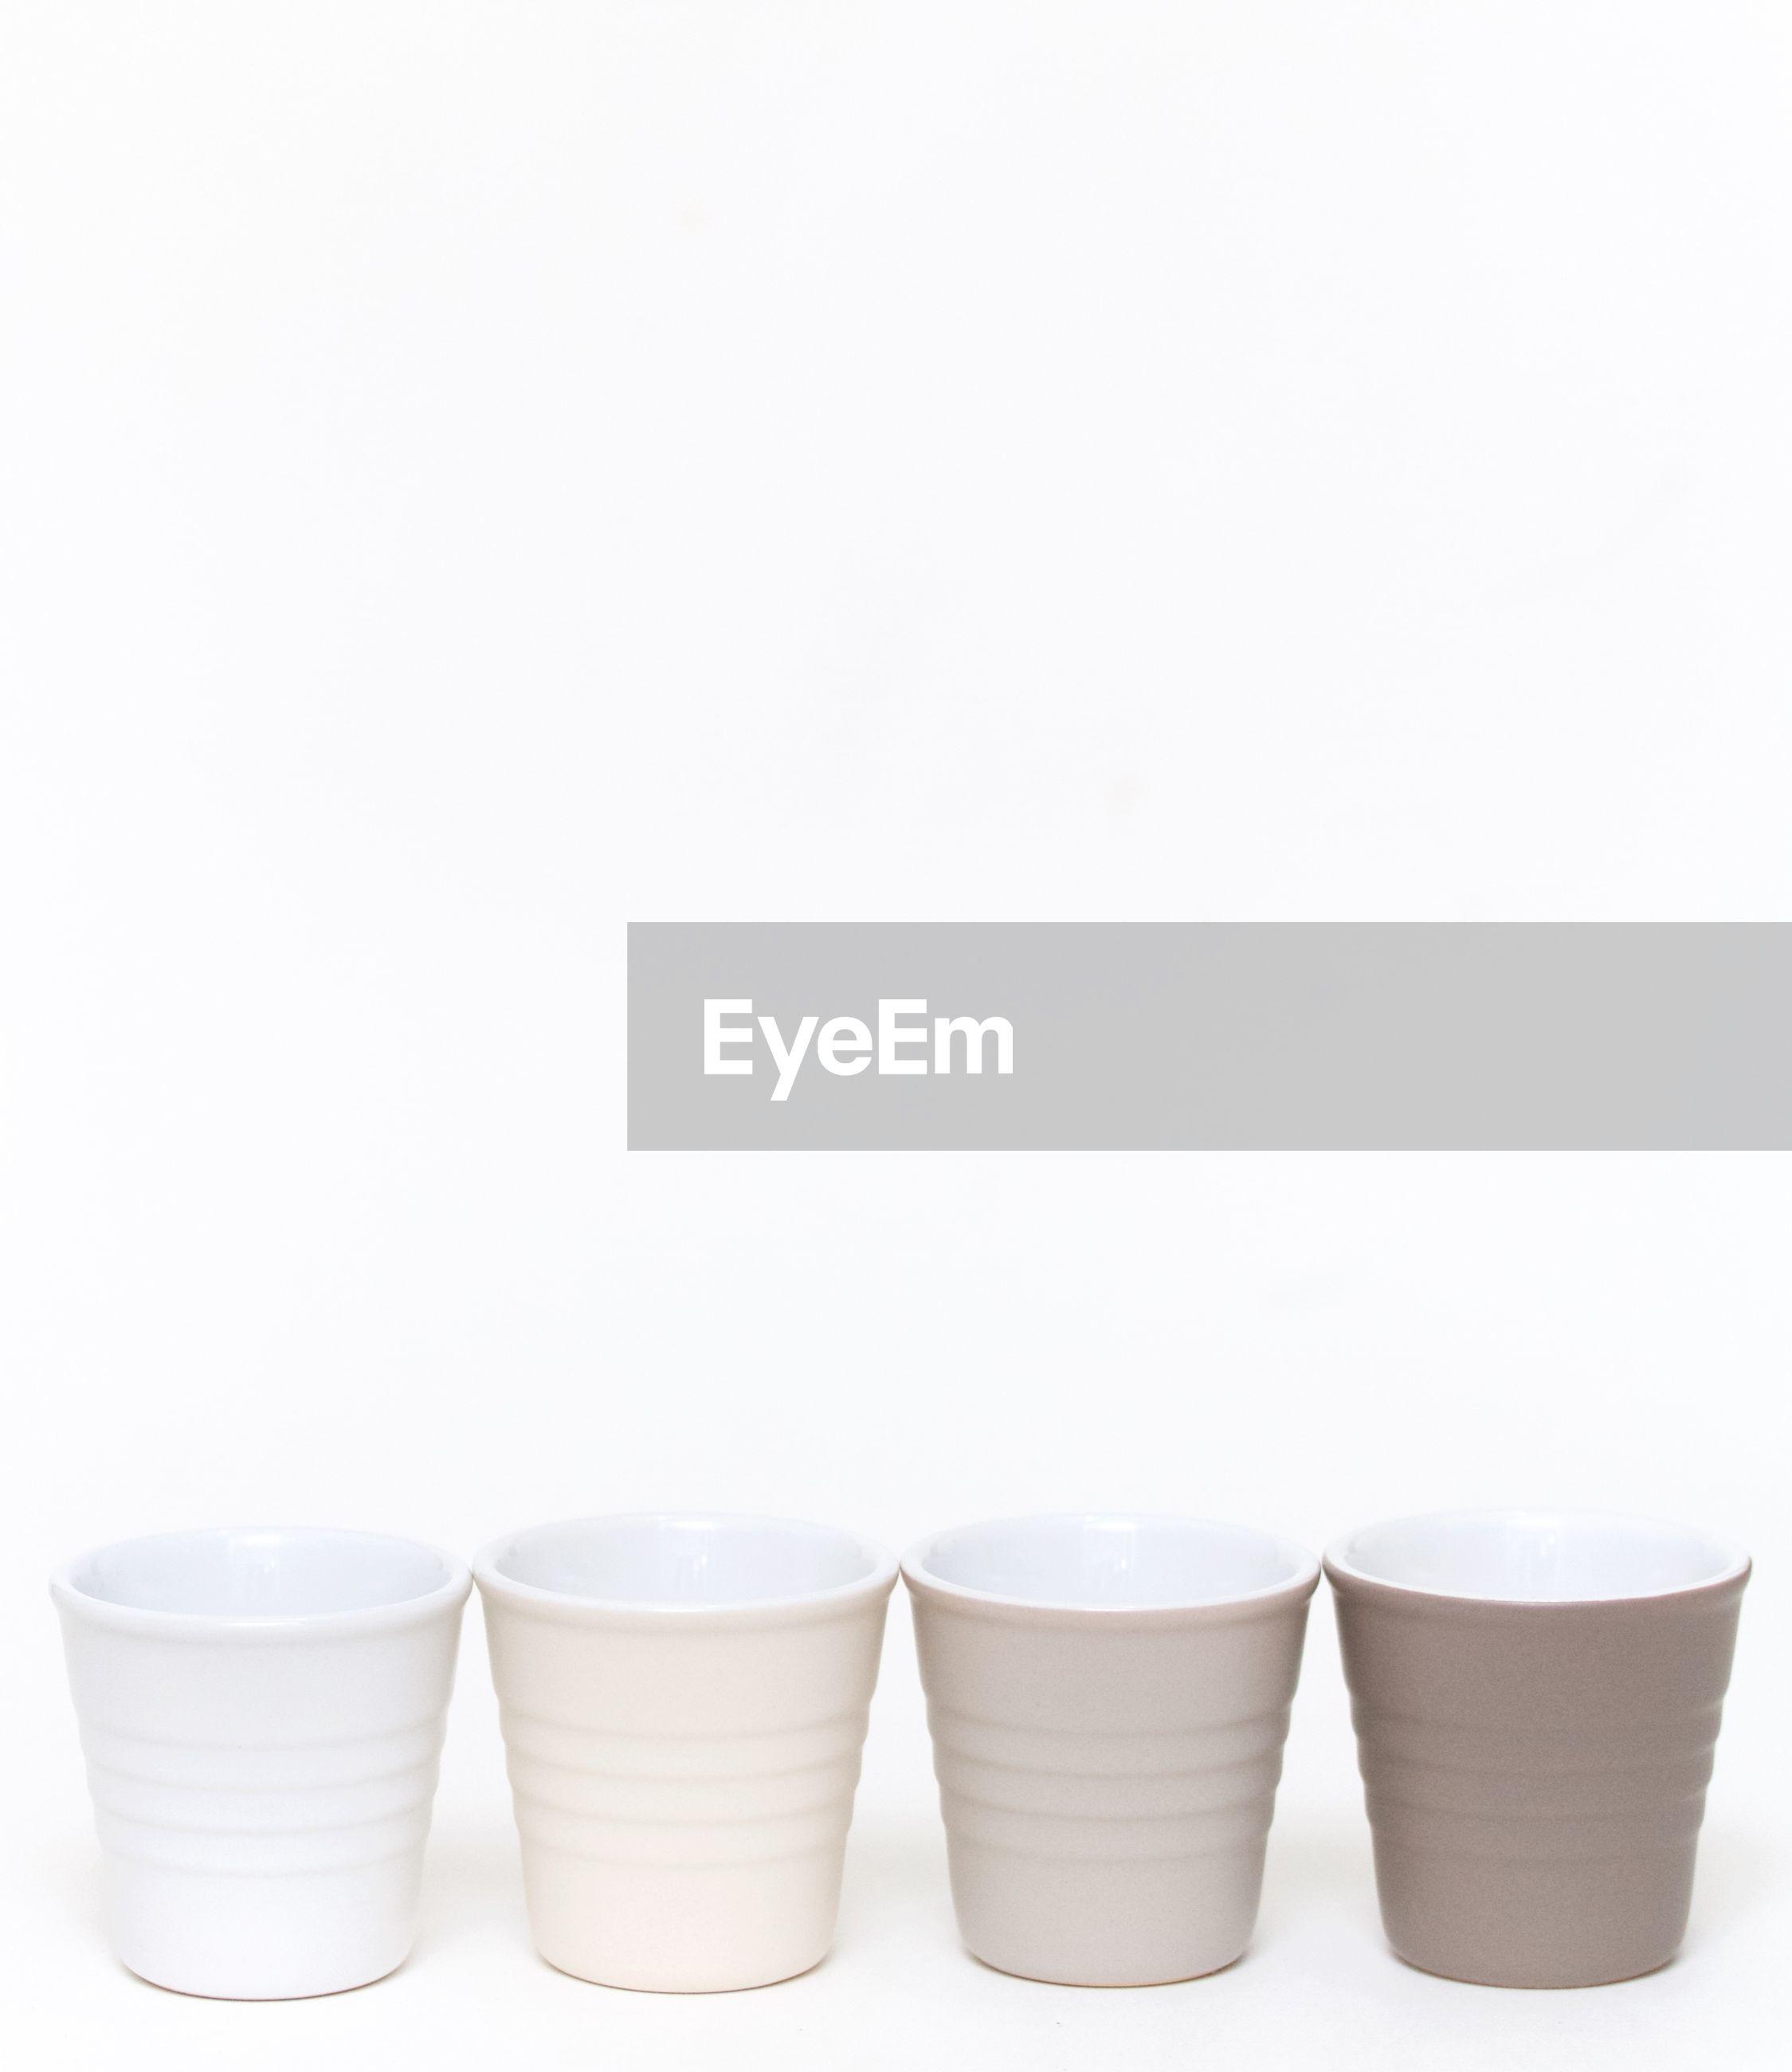 Empty glasses against white background